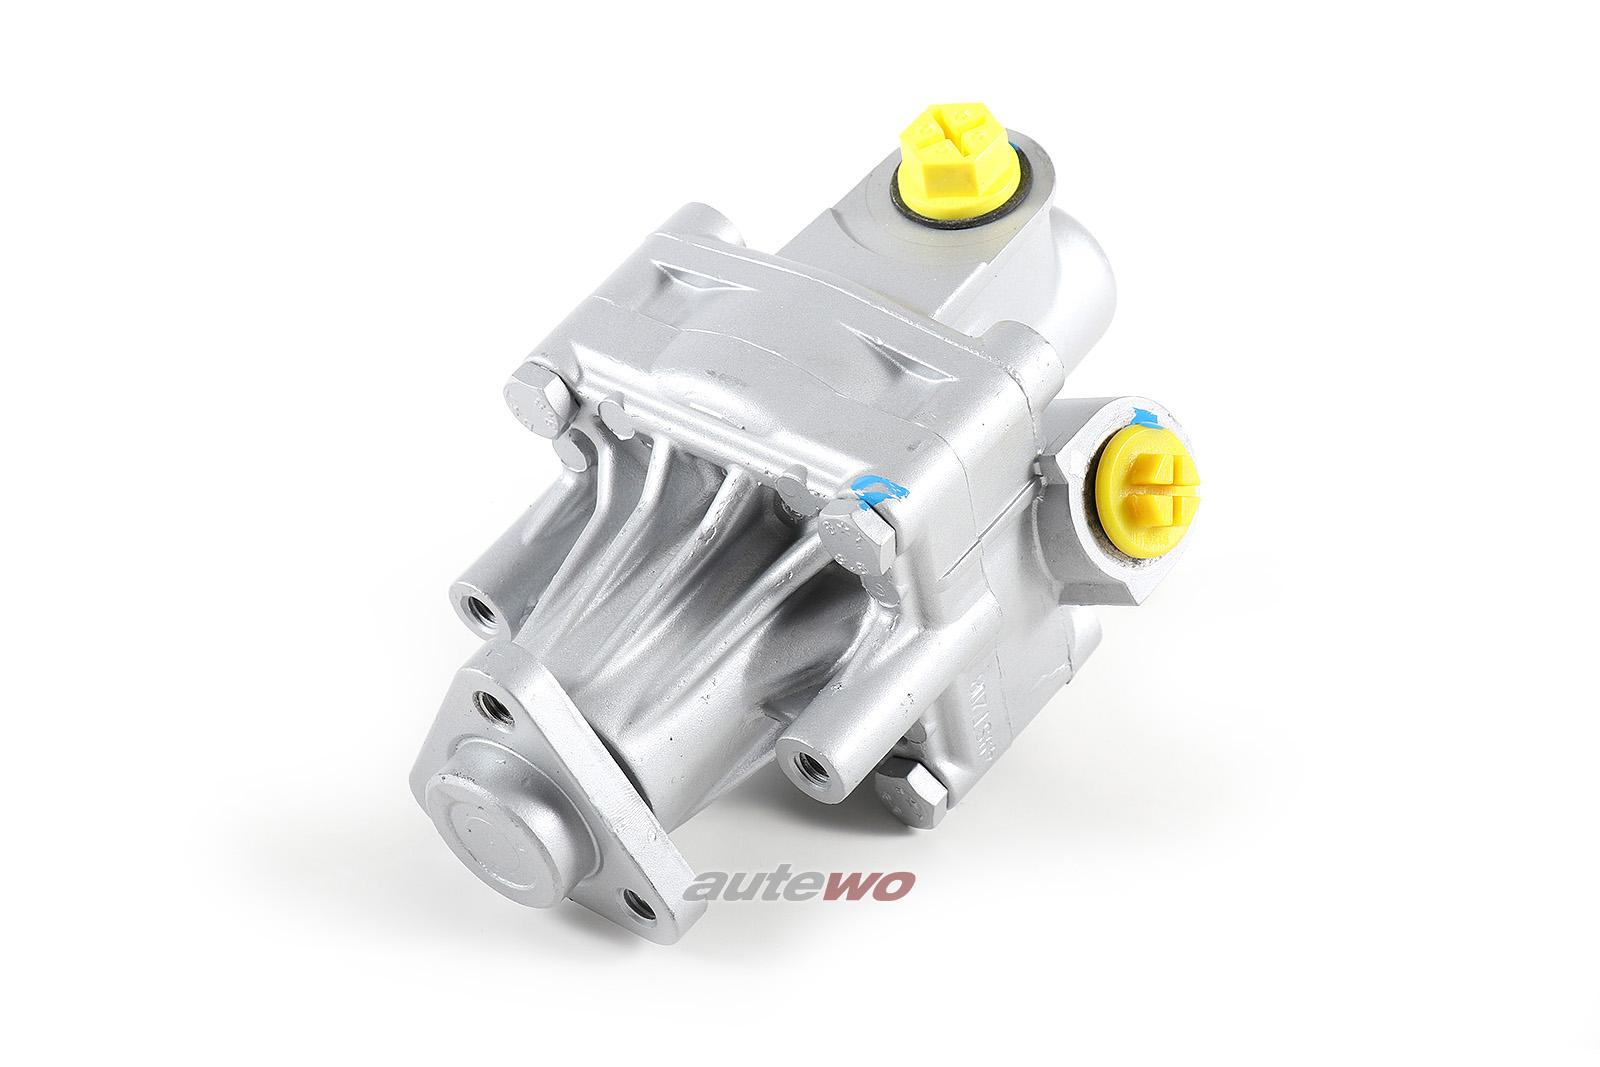 #050145155C Audi 80 B4/Coupe/Cabrio Typ 89 2.6-2.8l V6 Servopumpe im Austausch